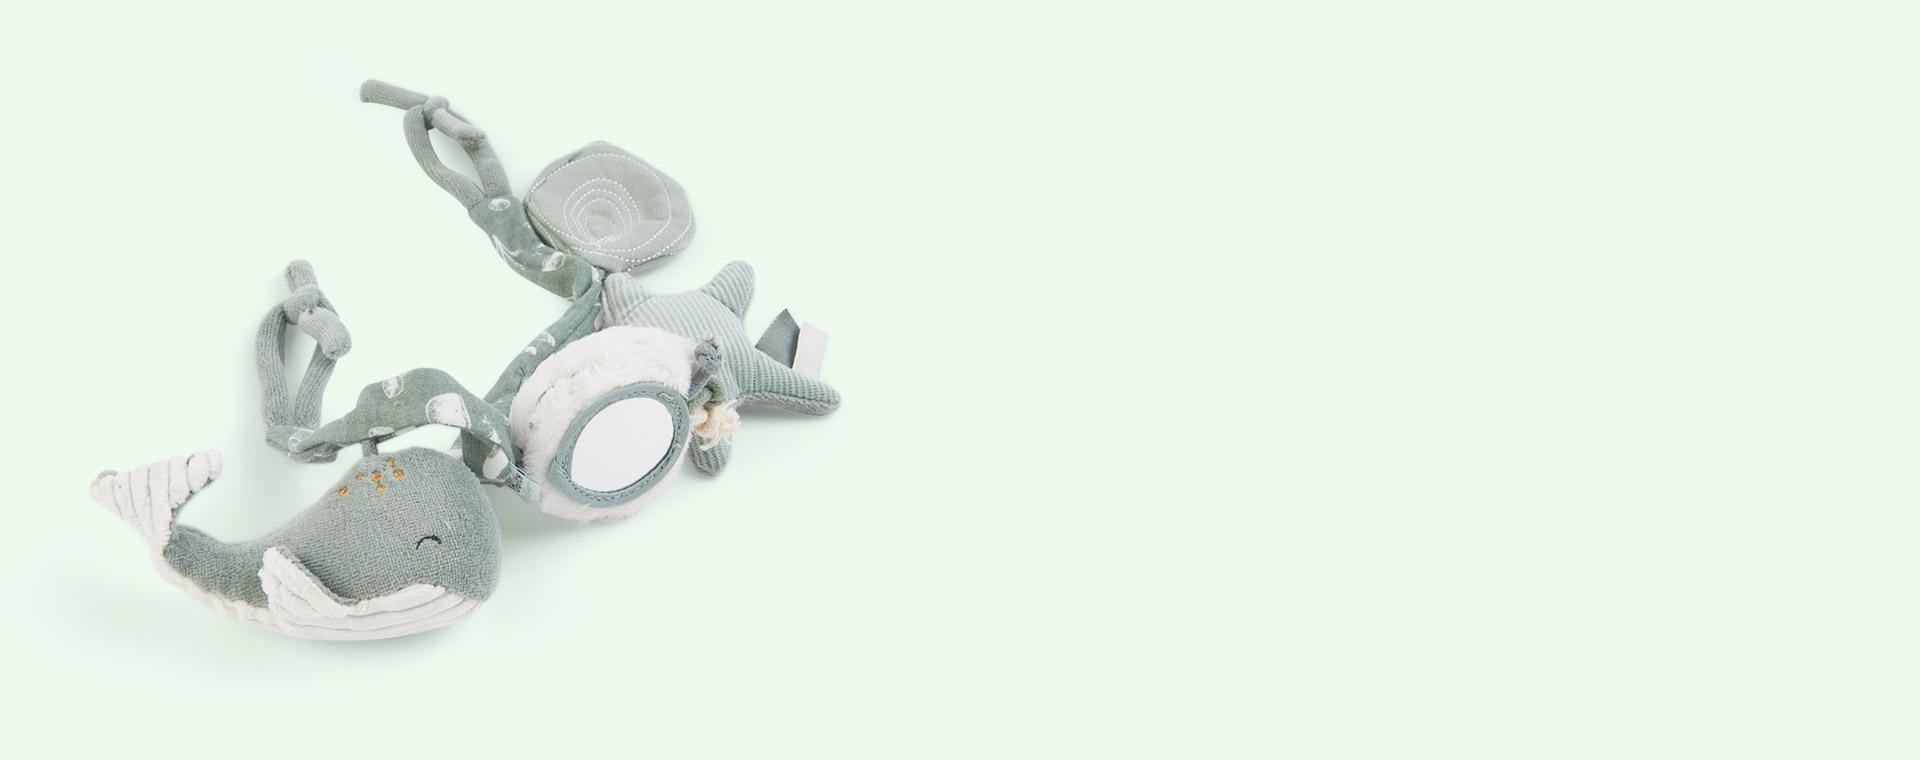 Ocean Mint Little Dutch Stroller Toy Chain